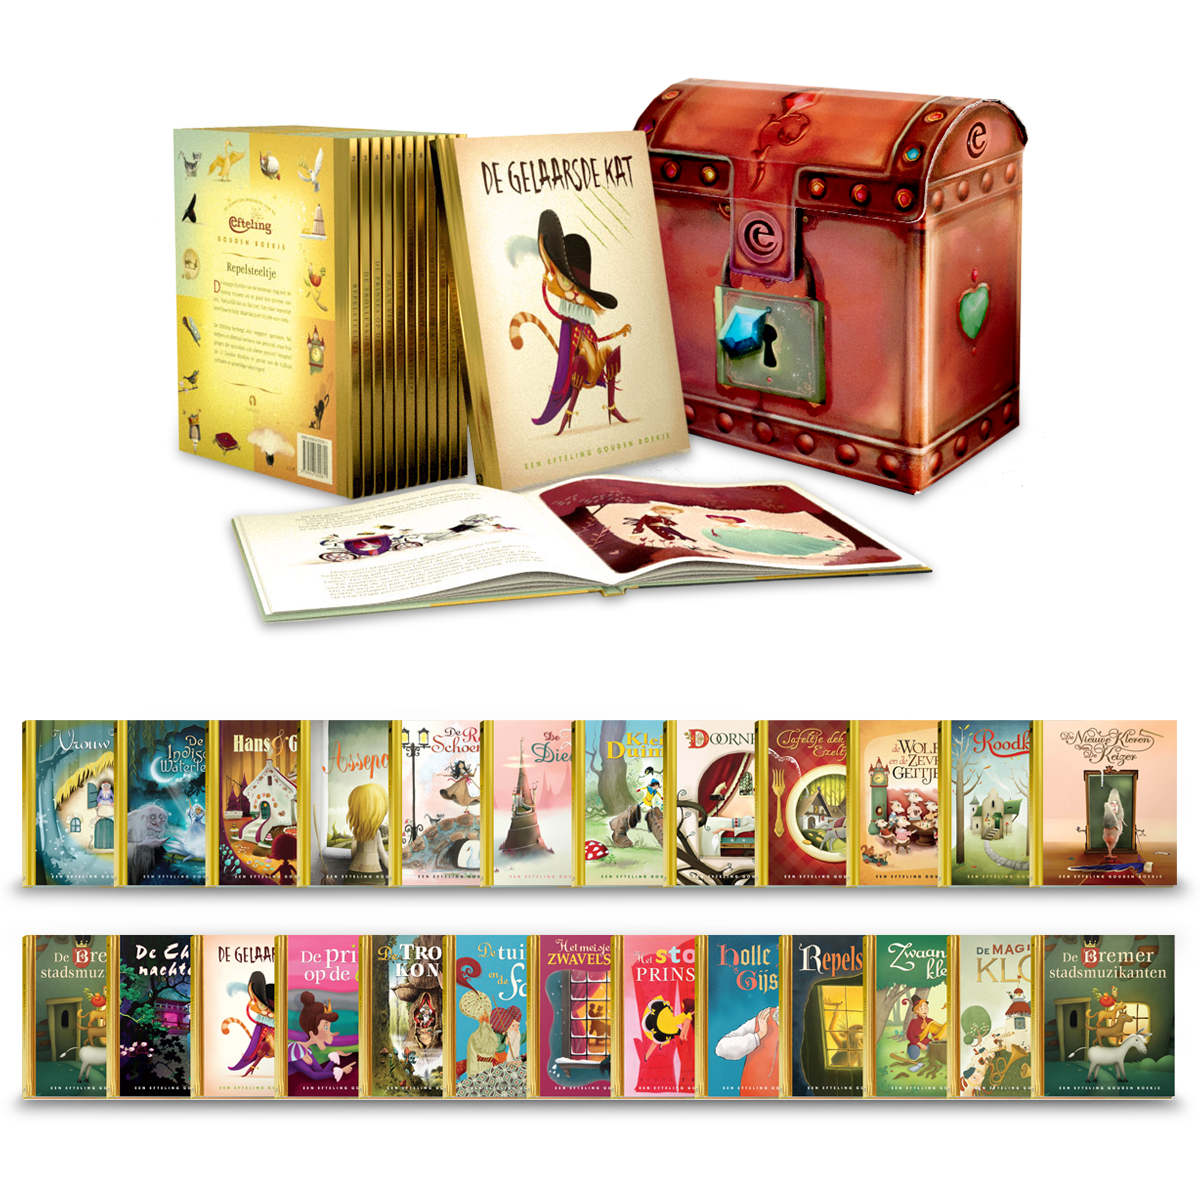 Efteling Gouden Boekjes | Rubinstein | AD | Coen Hamelink | illustrator